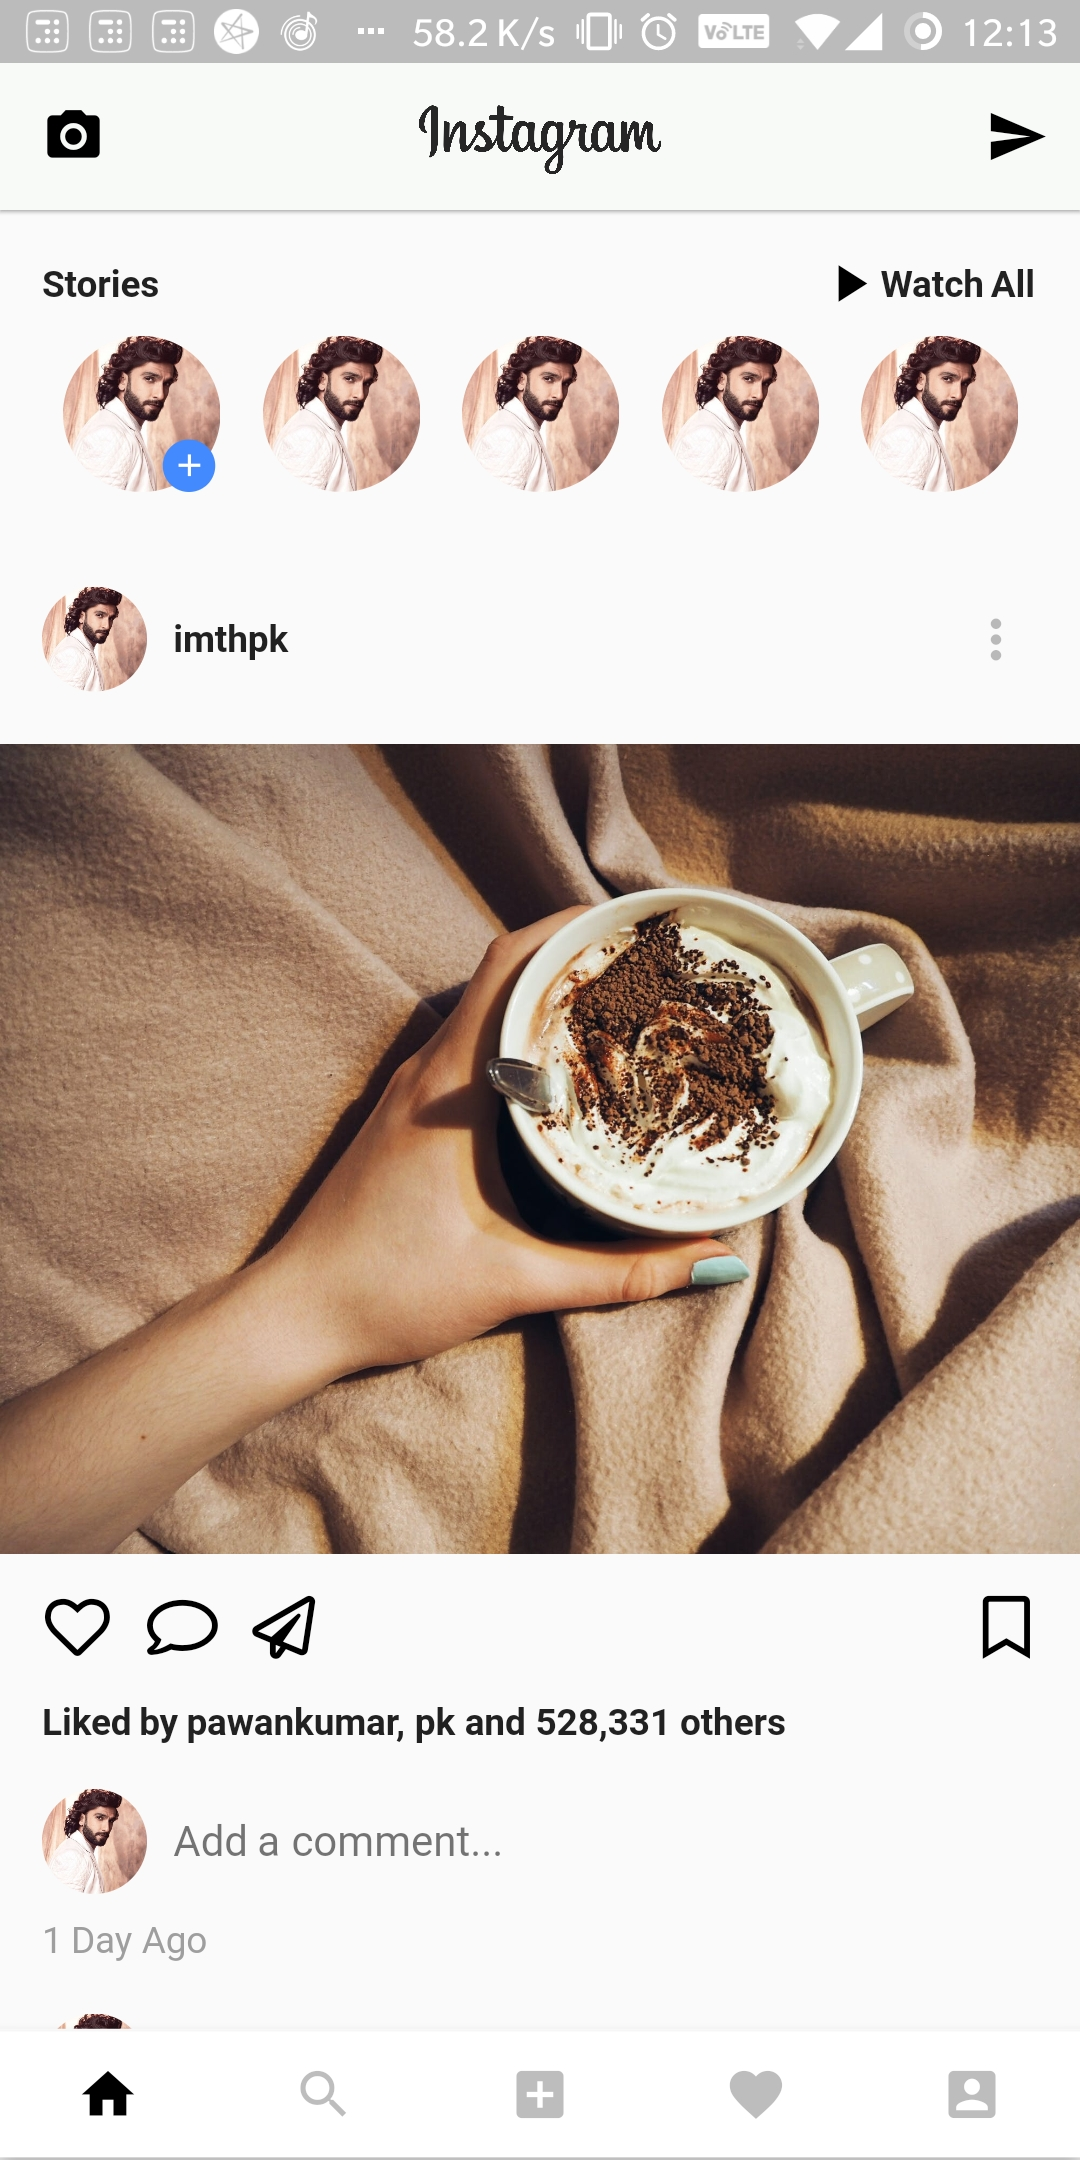 flutter instagram ui clone.